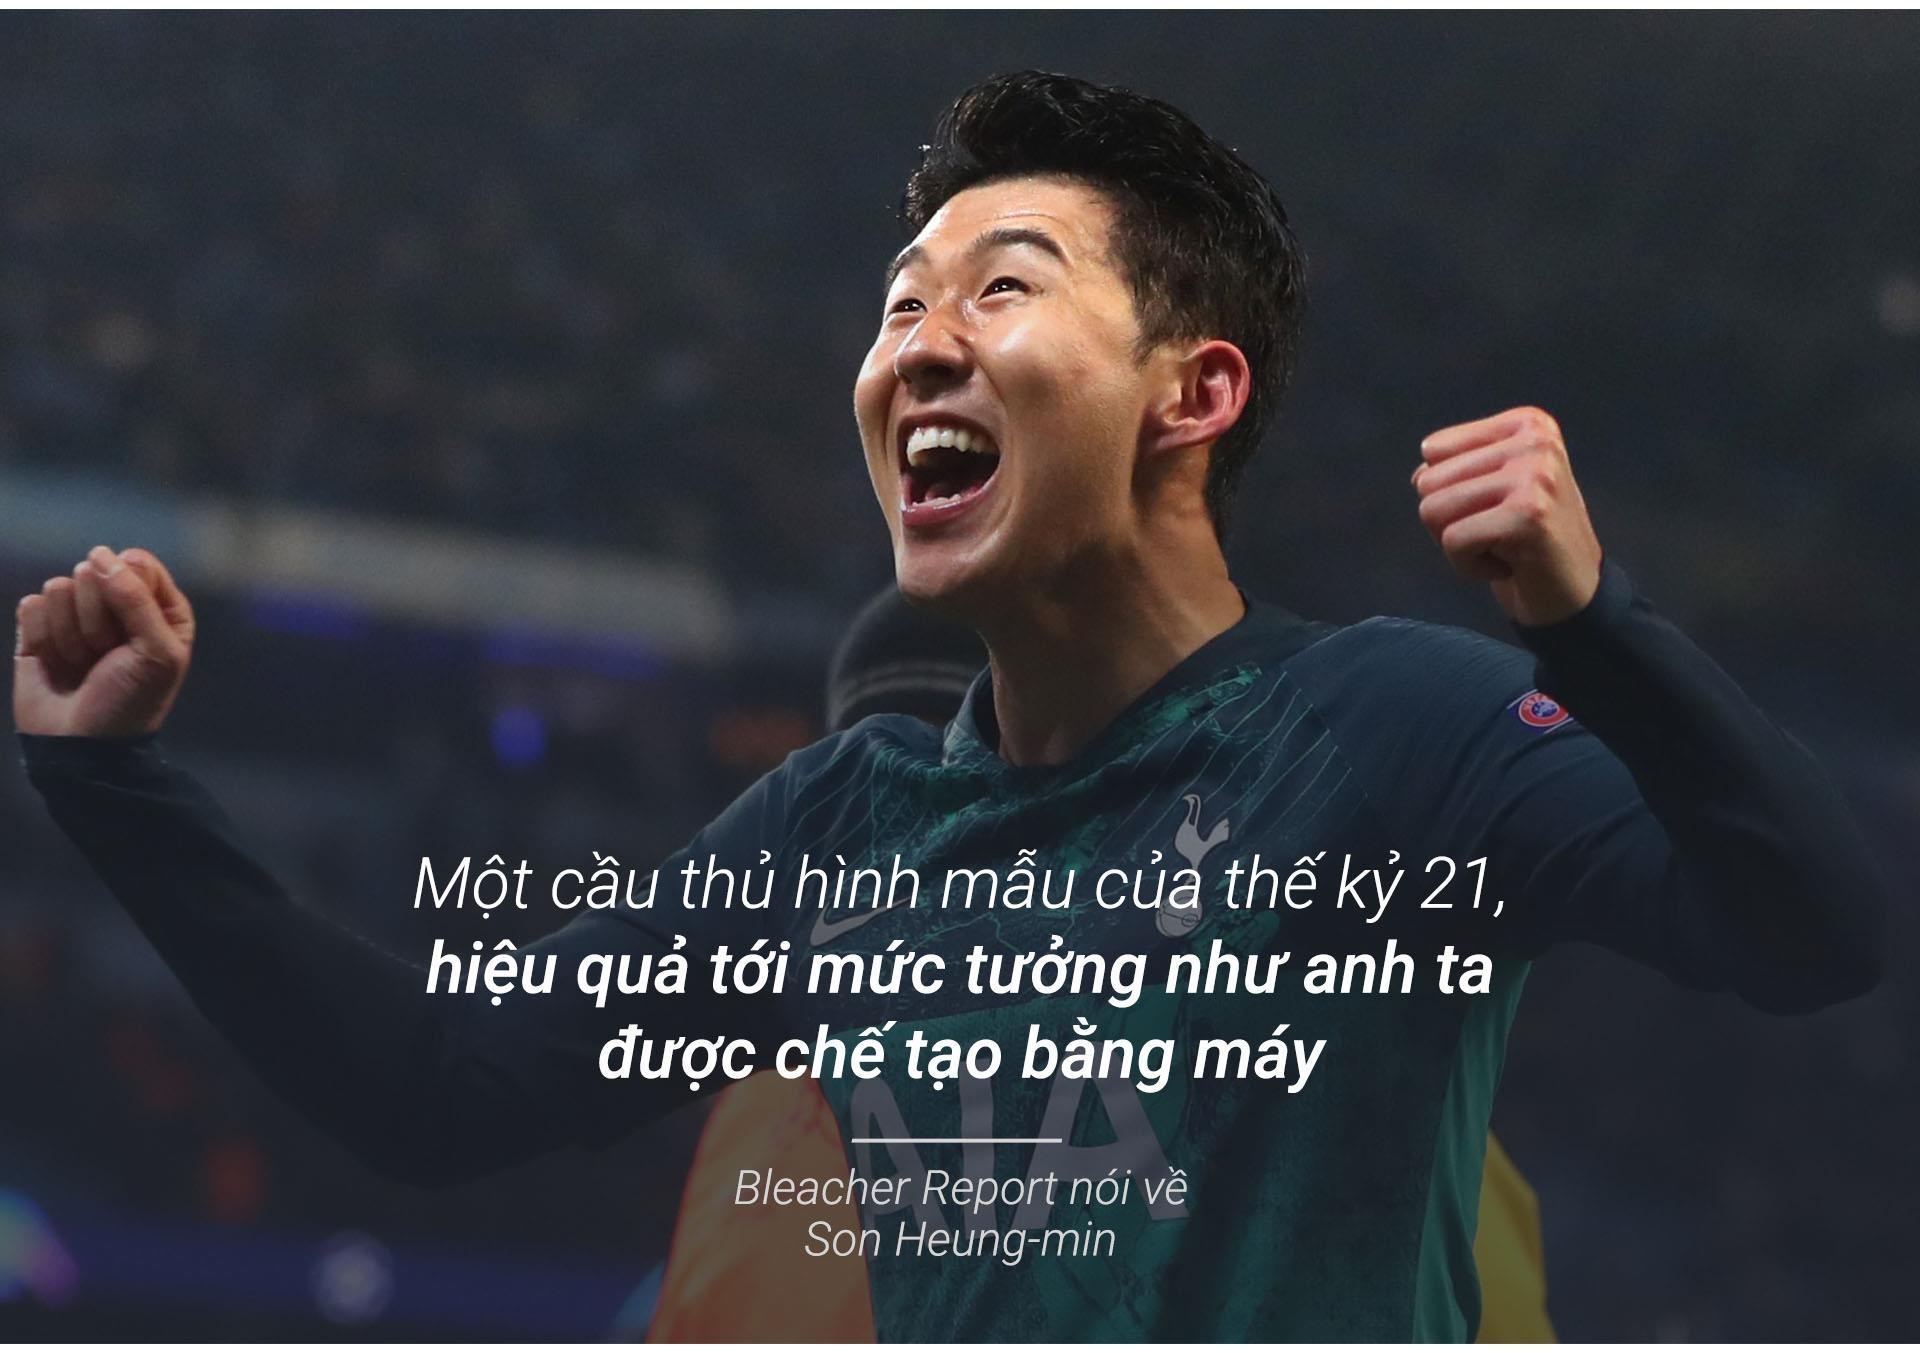 Son Heung-min vo dich Champions League de vuot Park Ji-sung hinh anh 13